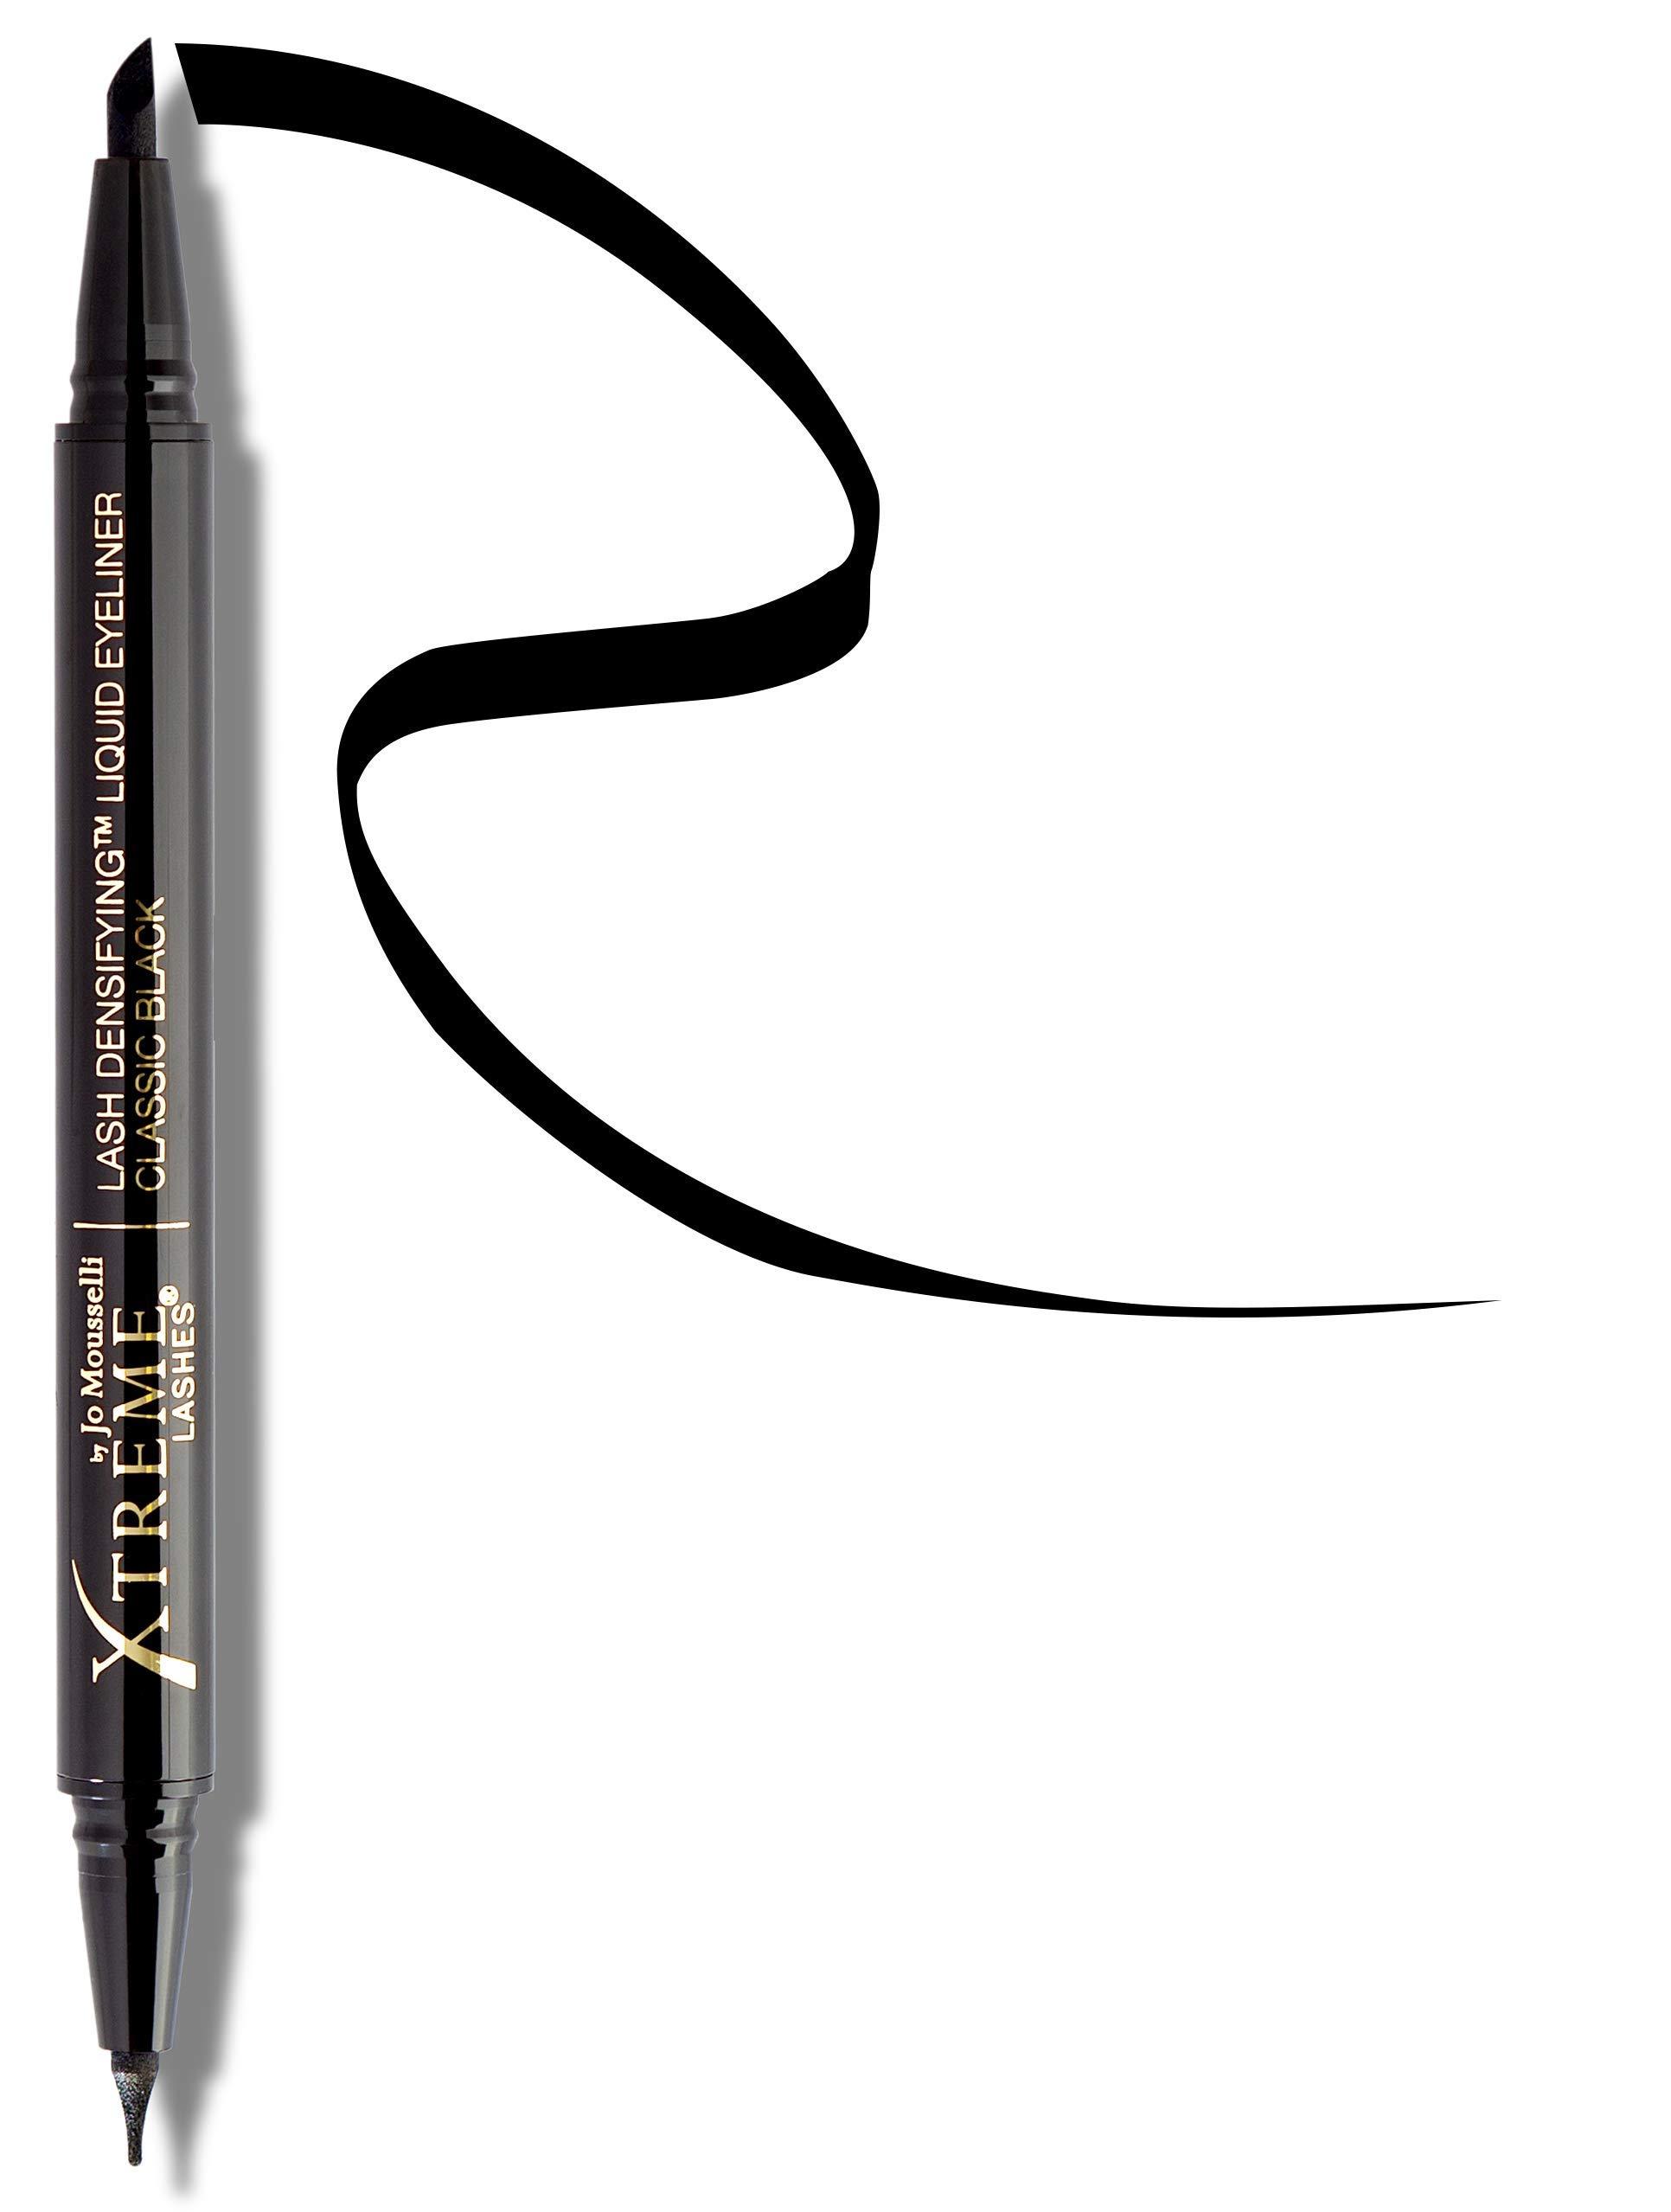 Xtreme Lashes Lash Densifying Liquid Eyeliner, Classic Black - Hypoallergenic & Dermatologist Tested - Eyelash Extension Compatible by Xtreme Lashes